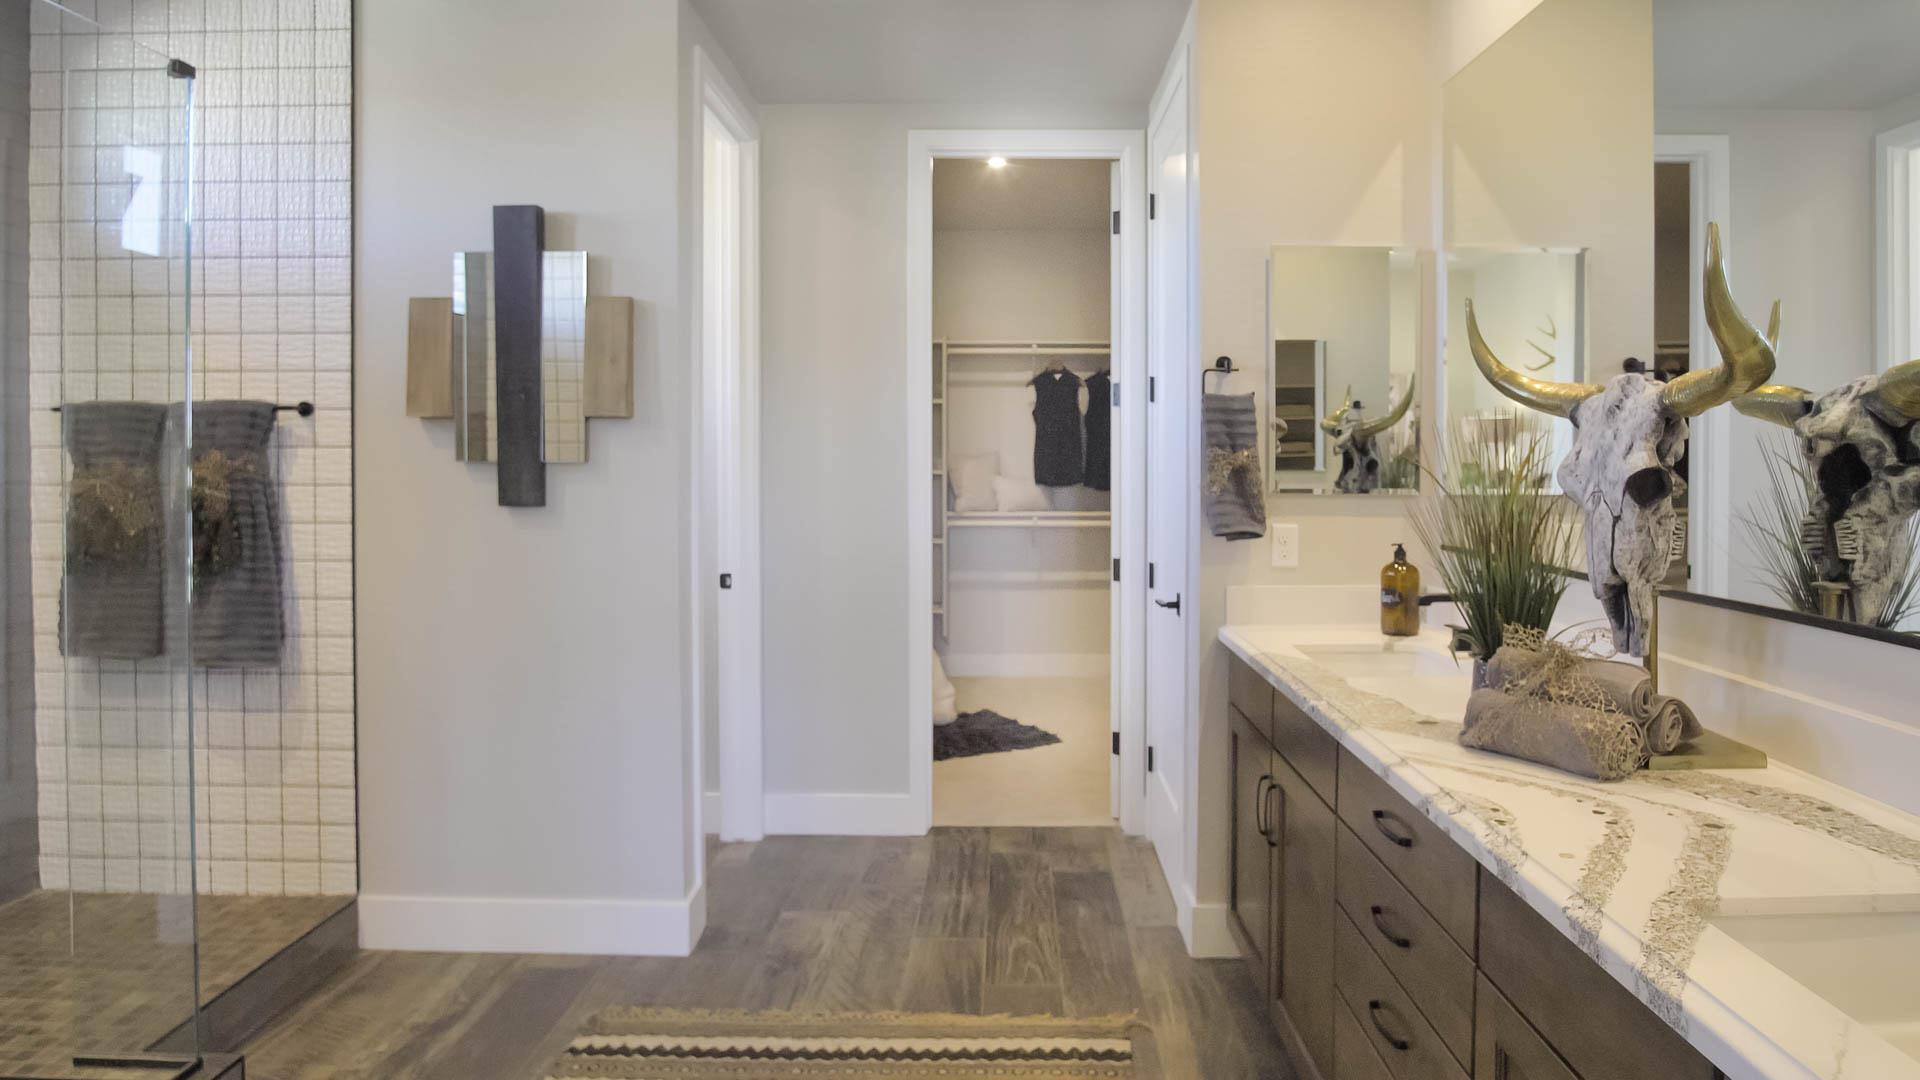 Bathroom featured in the J605 By Mandalay Homes in Prescott, AZ